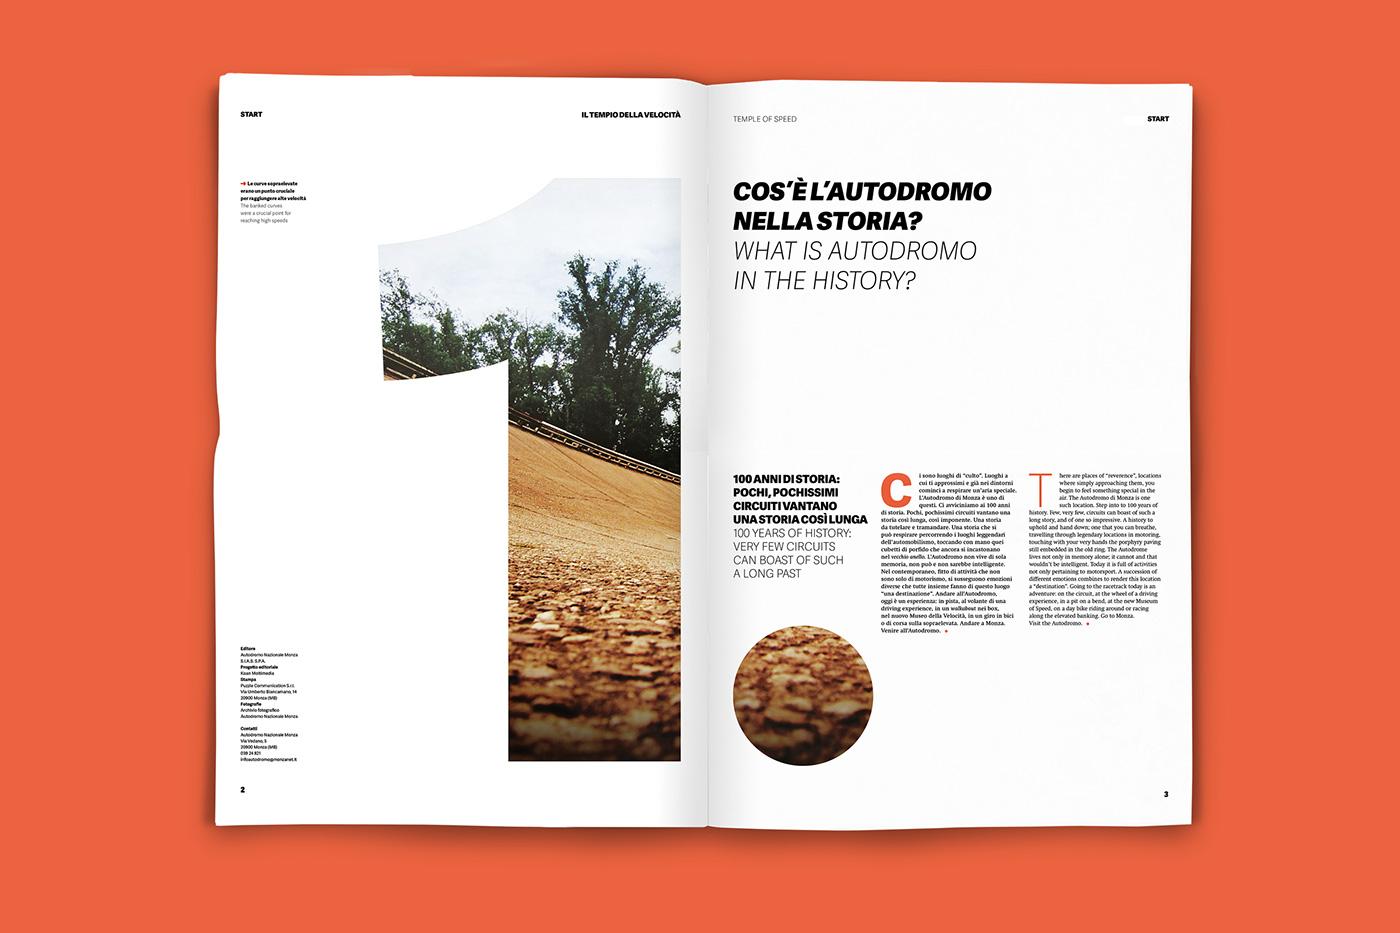 magazine tabloid monza Autodromo editorial car Racing f1